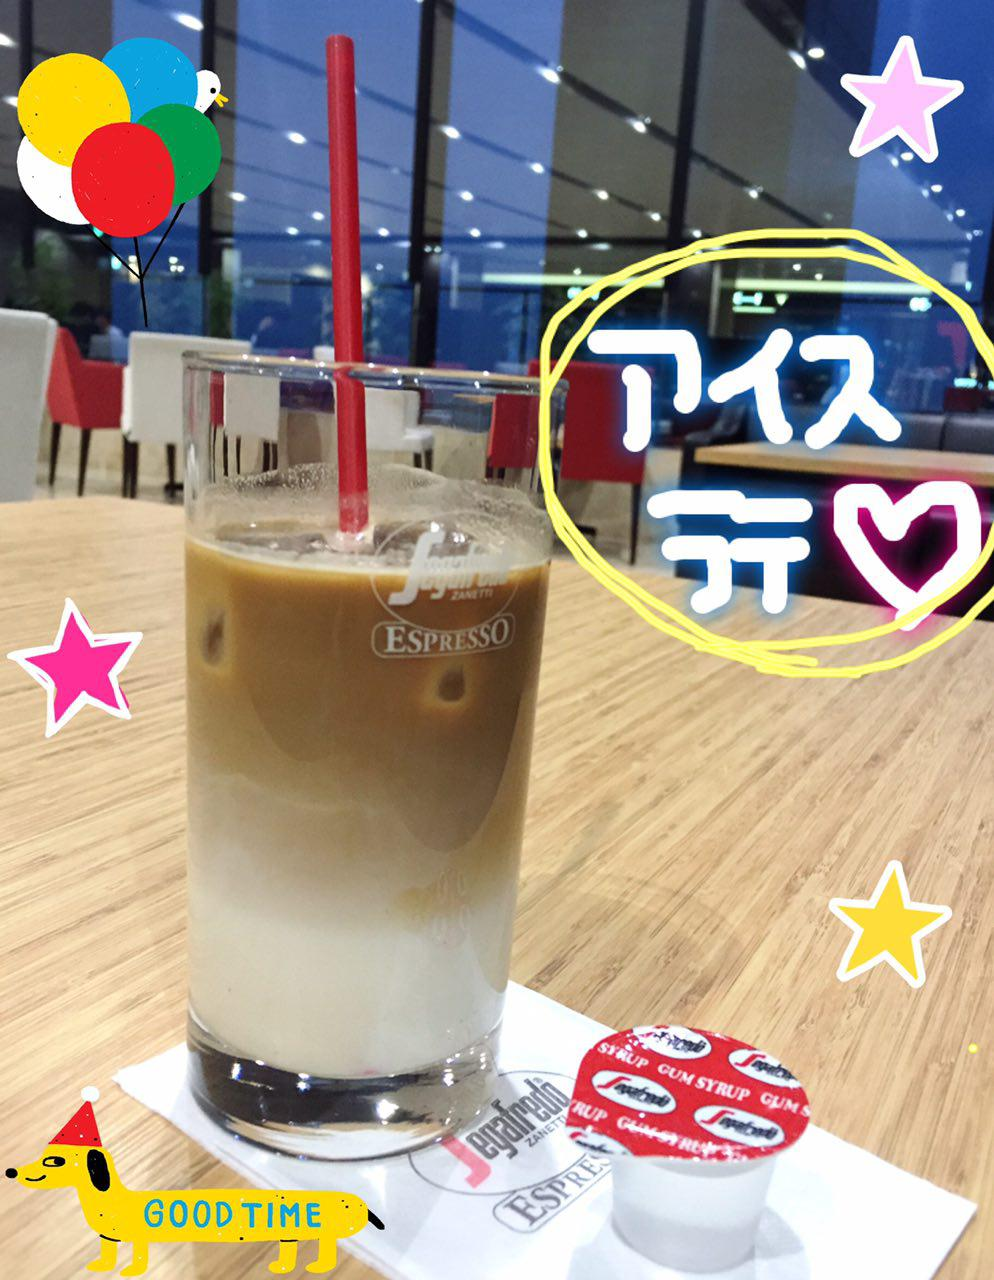 photo_2017-04-14_01-39-32.jpg